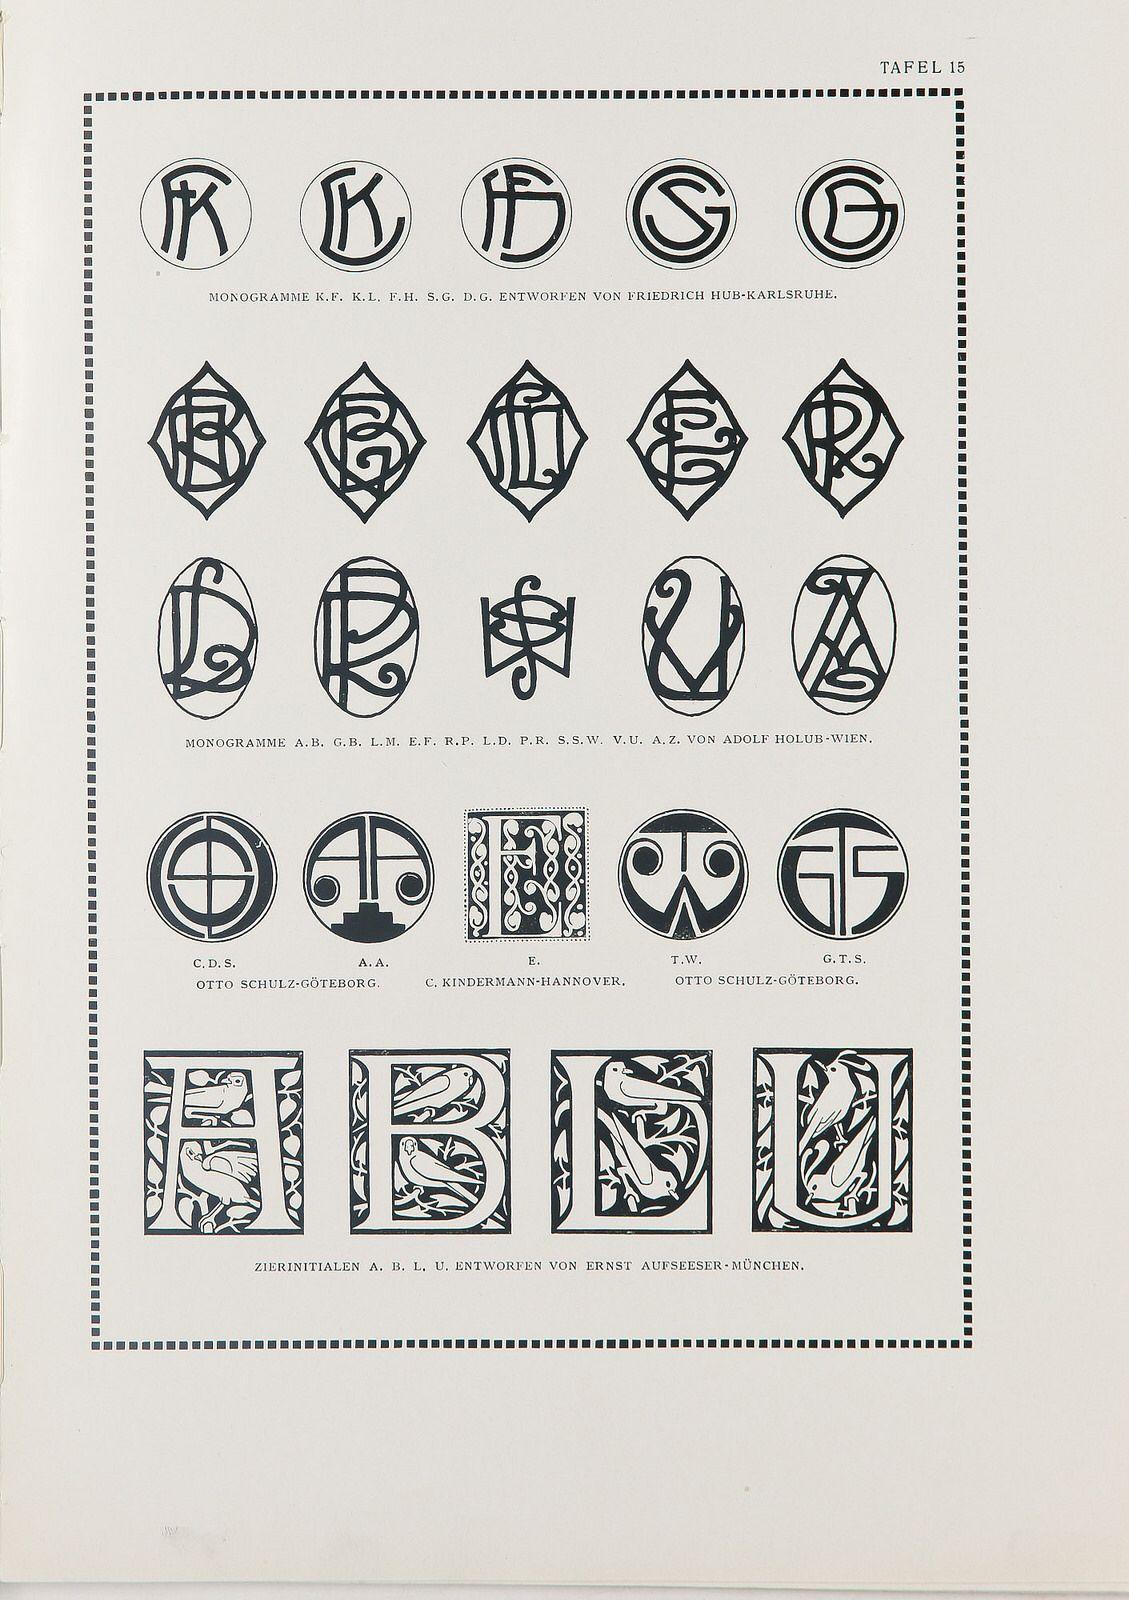 600 Monogramme Und Signets Hofrat Alexander Koch Art Nouveau Art Cards